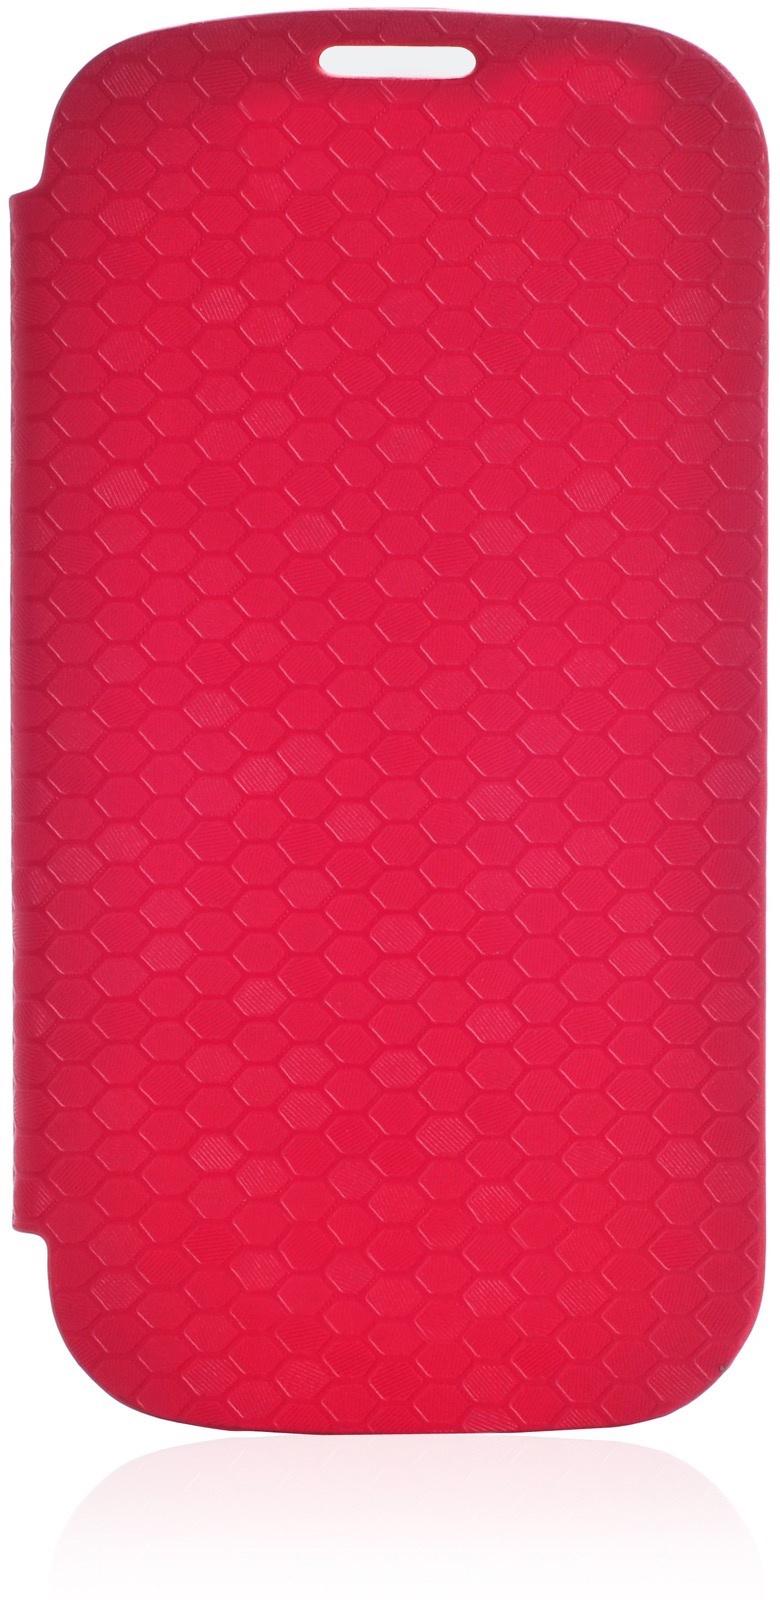 Чехол Gurdini Flip Case соты 380026 для Samsung Galaxy S3,380026, красный